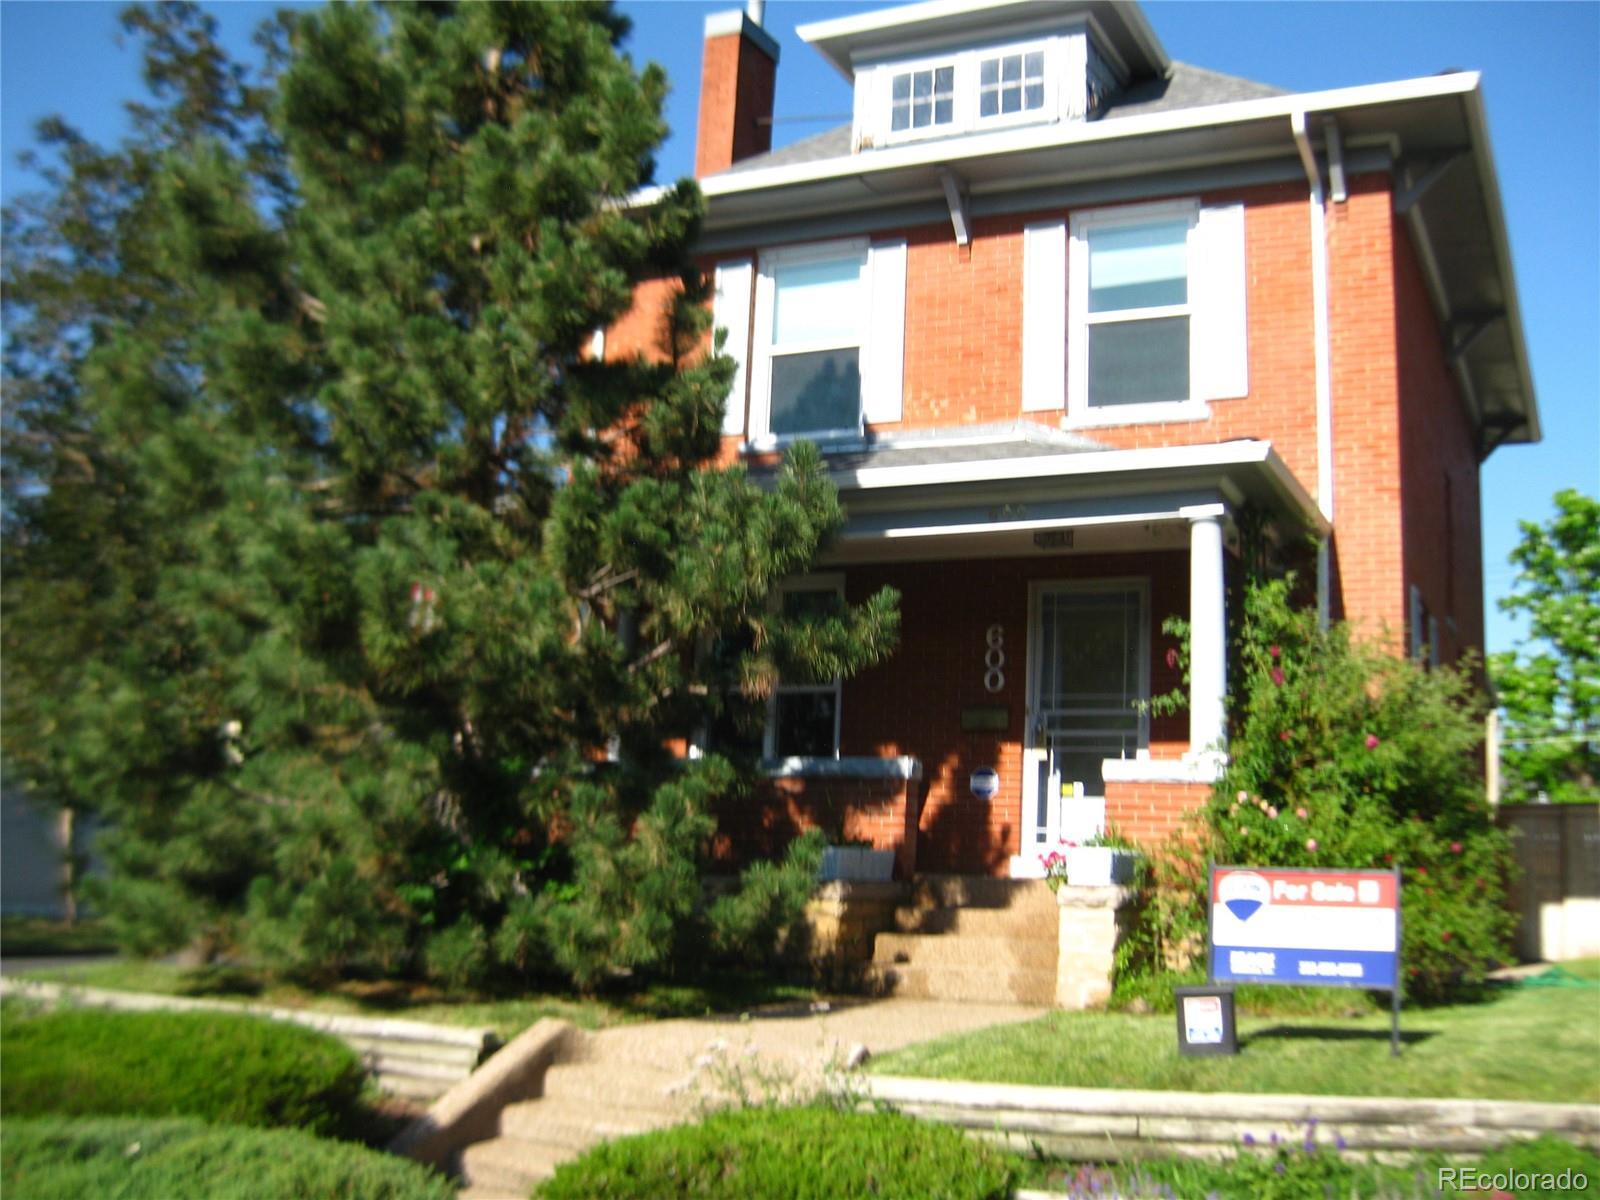 MLS# 3799727 - 1 - 600 S Pearl Street, Denver, CO 80209